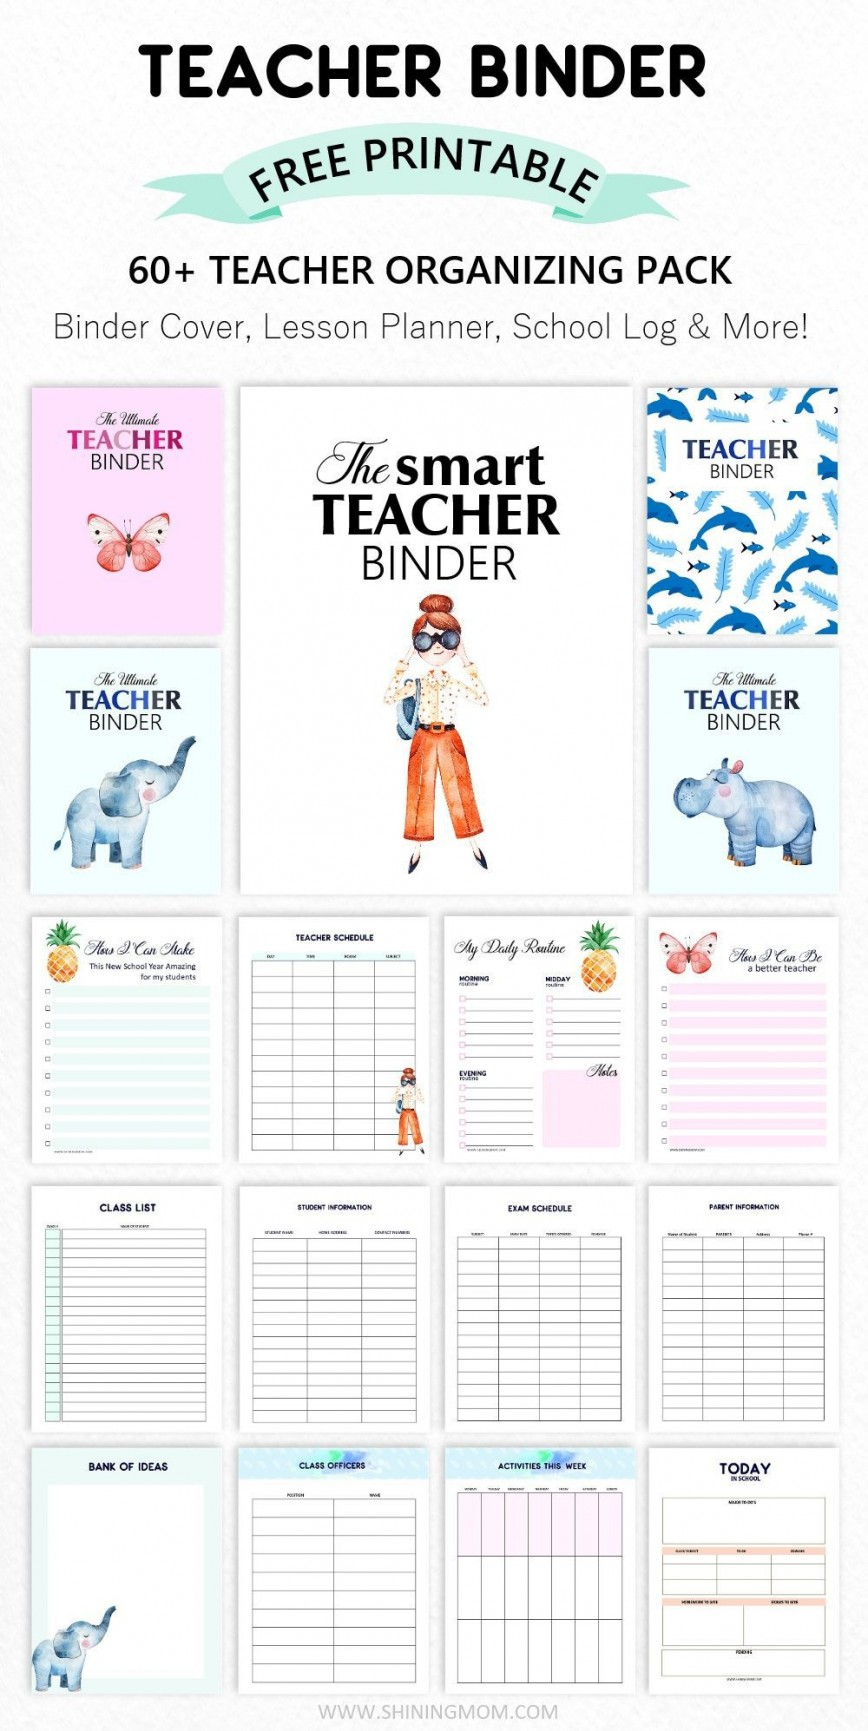 003 Formidable Free Printable Teacher Binder Template High Resolution 868